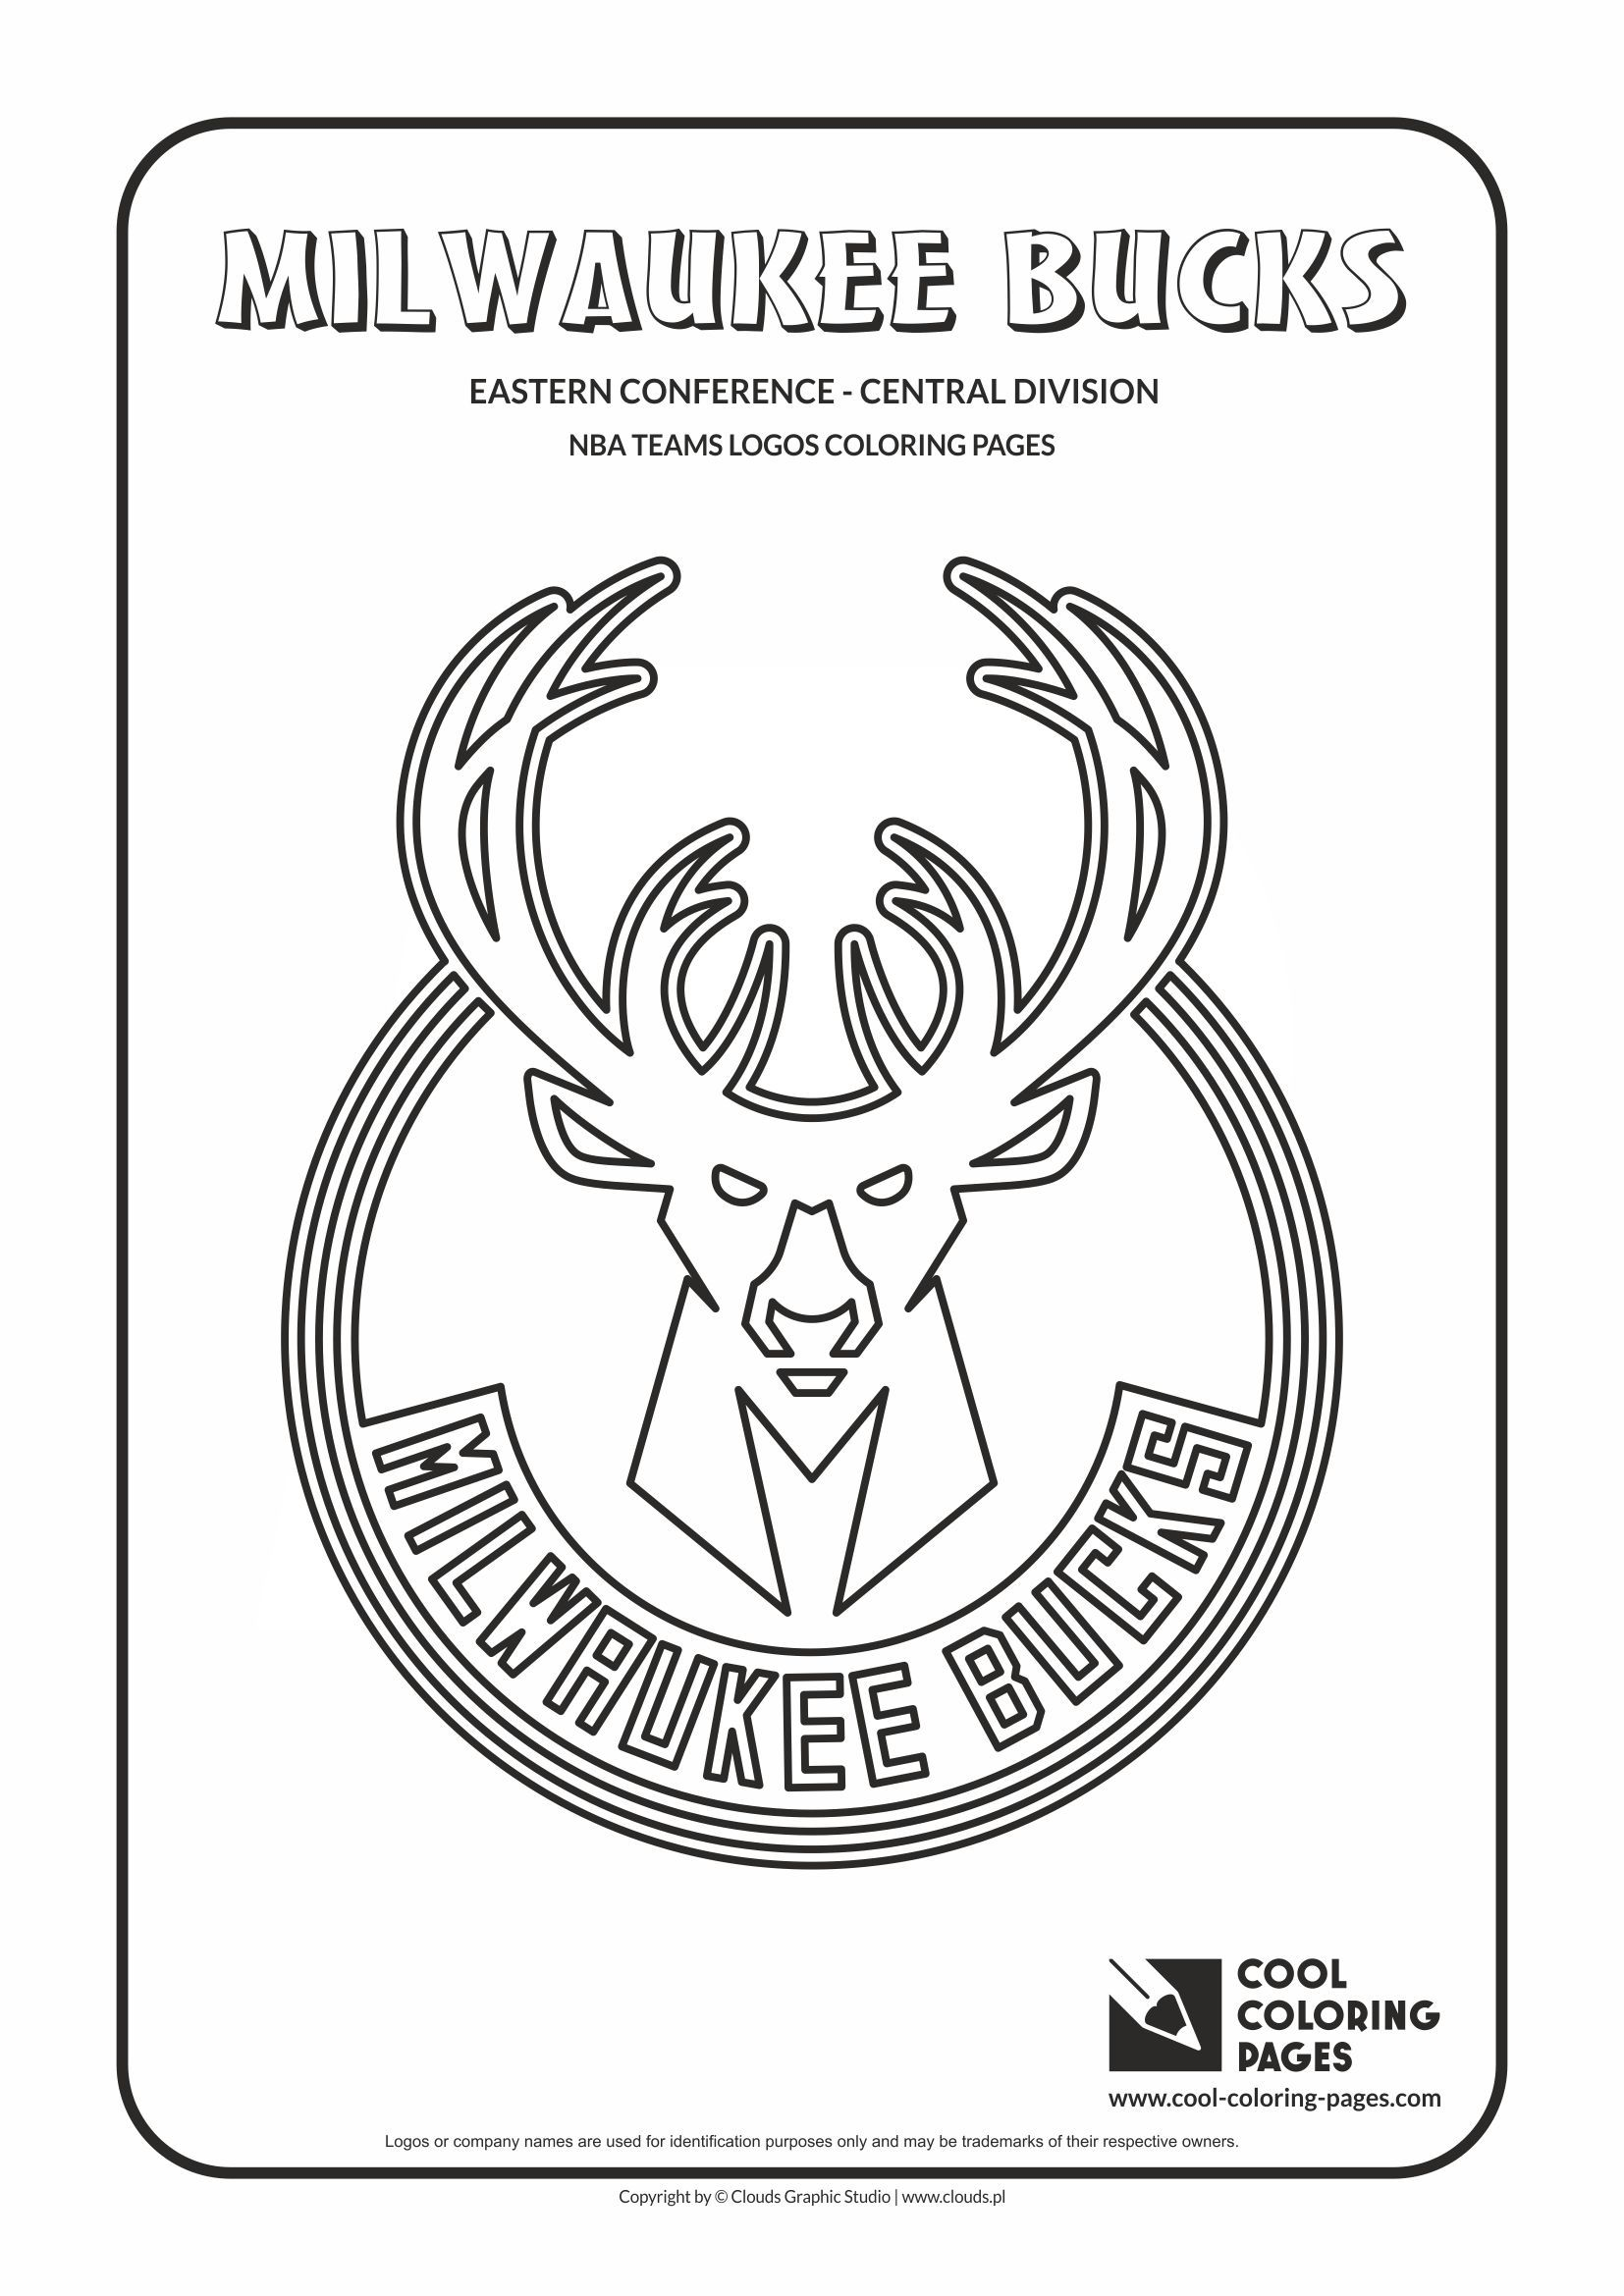 cool coloring pages nba teams logos milwaukee bucks